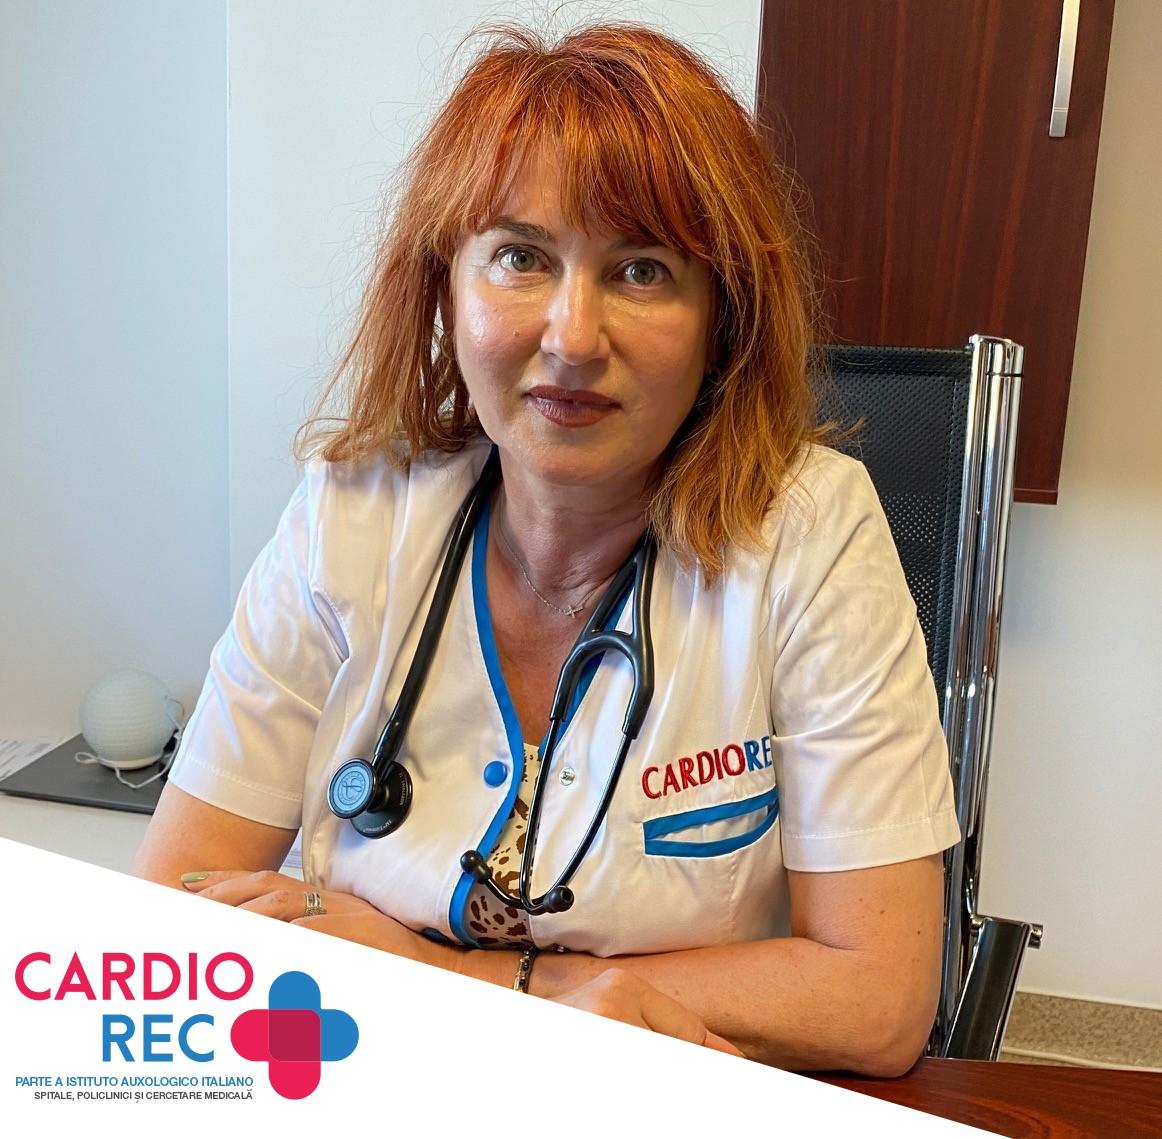 Dr. Anca Tau - Consultatii Cardiologie, interpretare de EKG, EKG de efort, Holter TA si Holter EKG si ecografii de cord